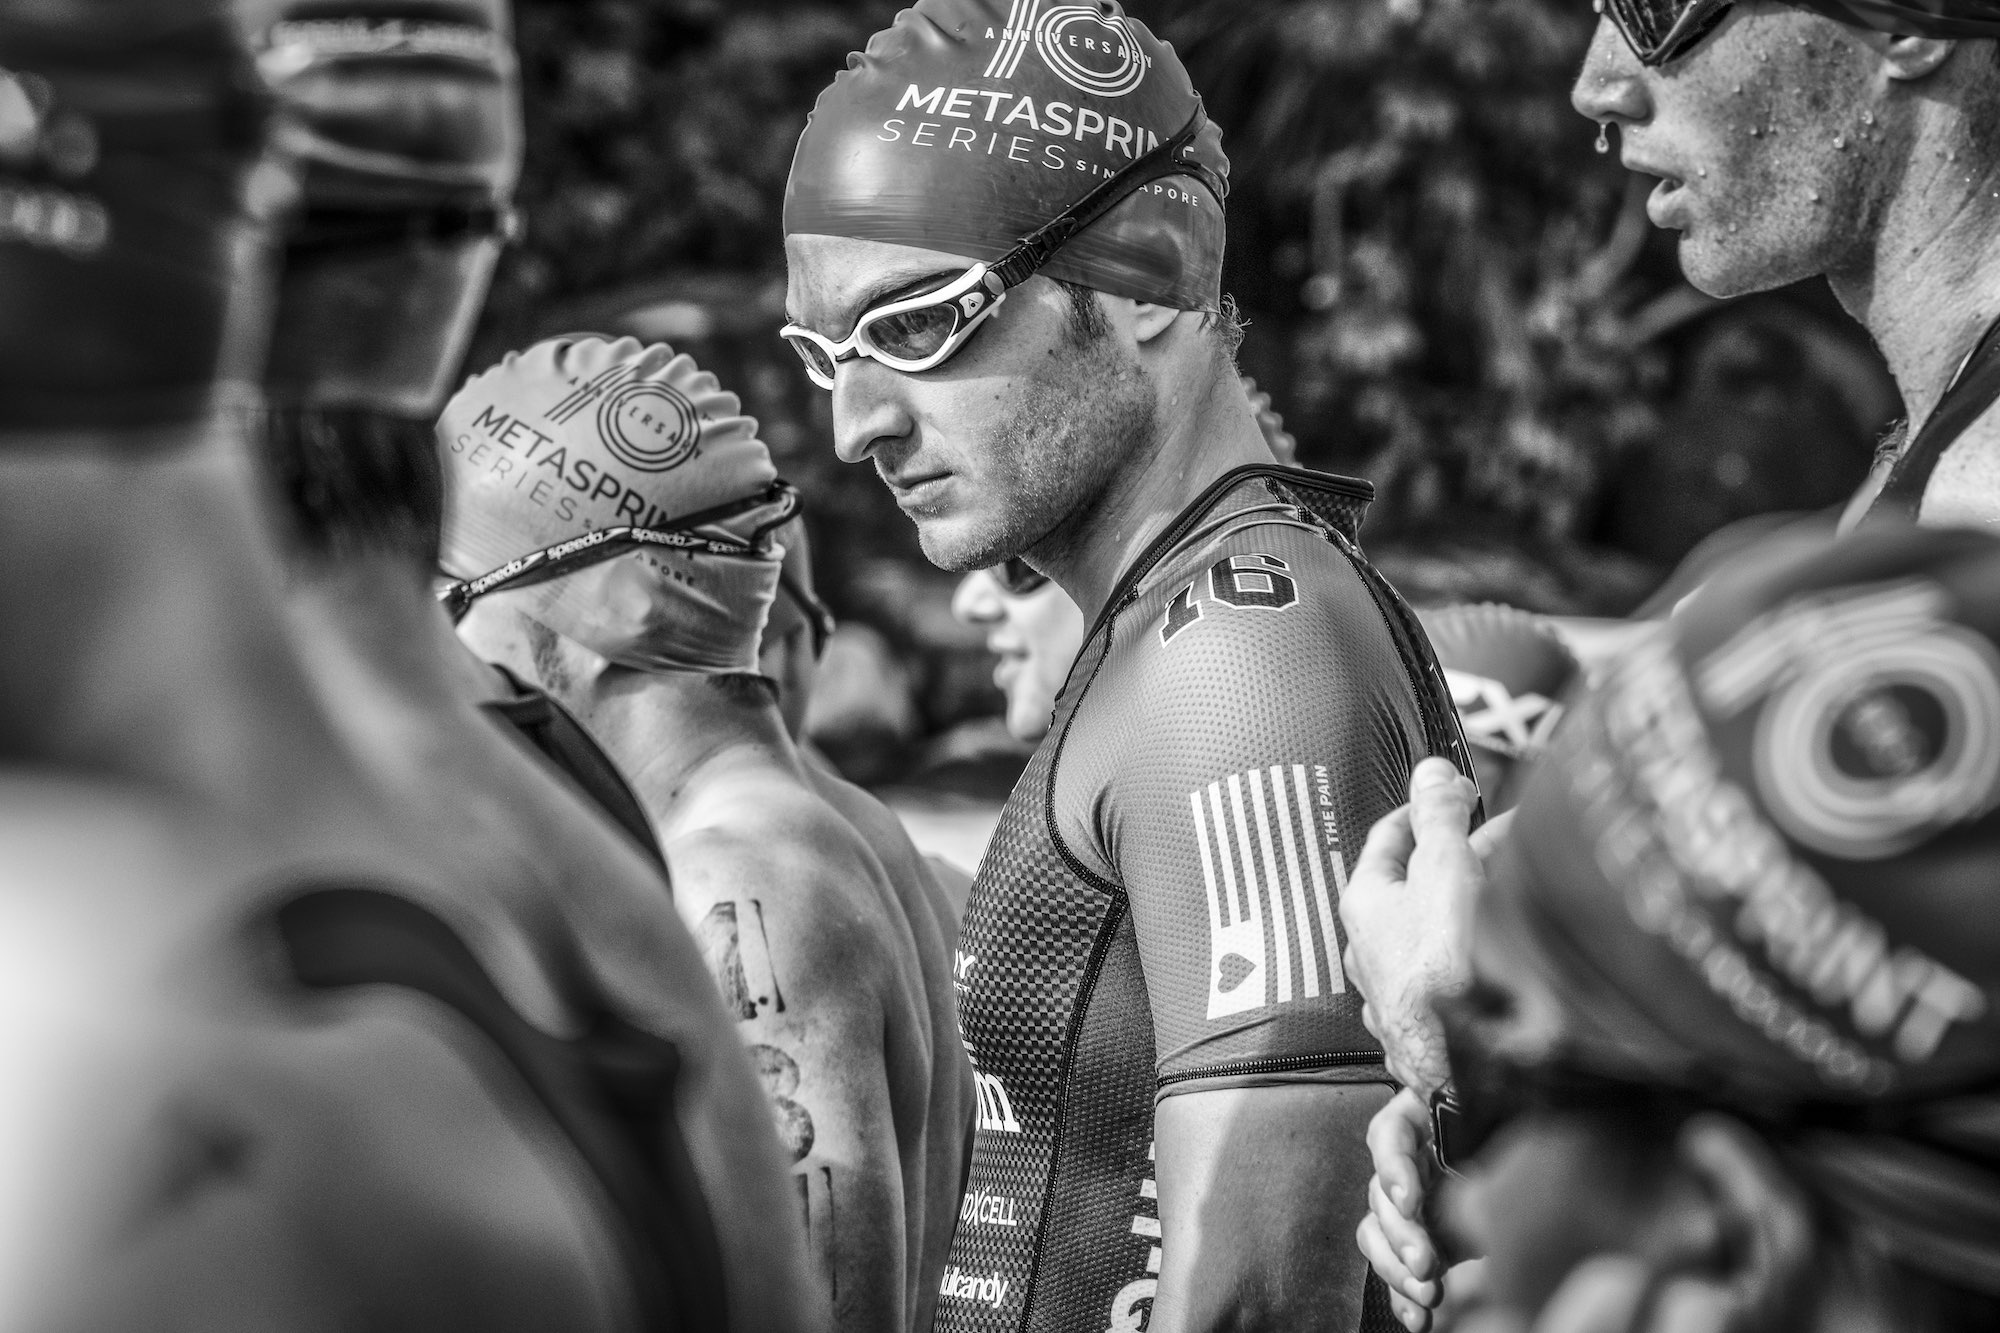 Corporate photography sport events race competition Sinagpore sg photographer triathlon triathlete athlete